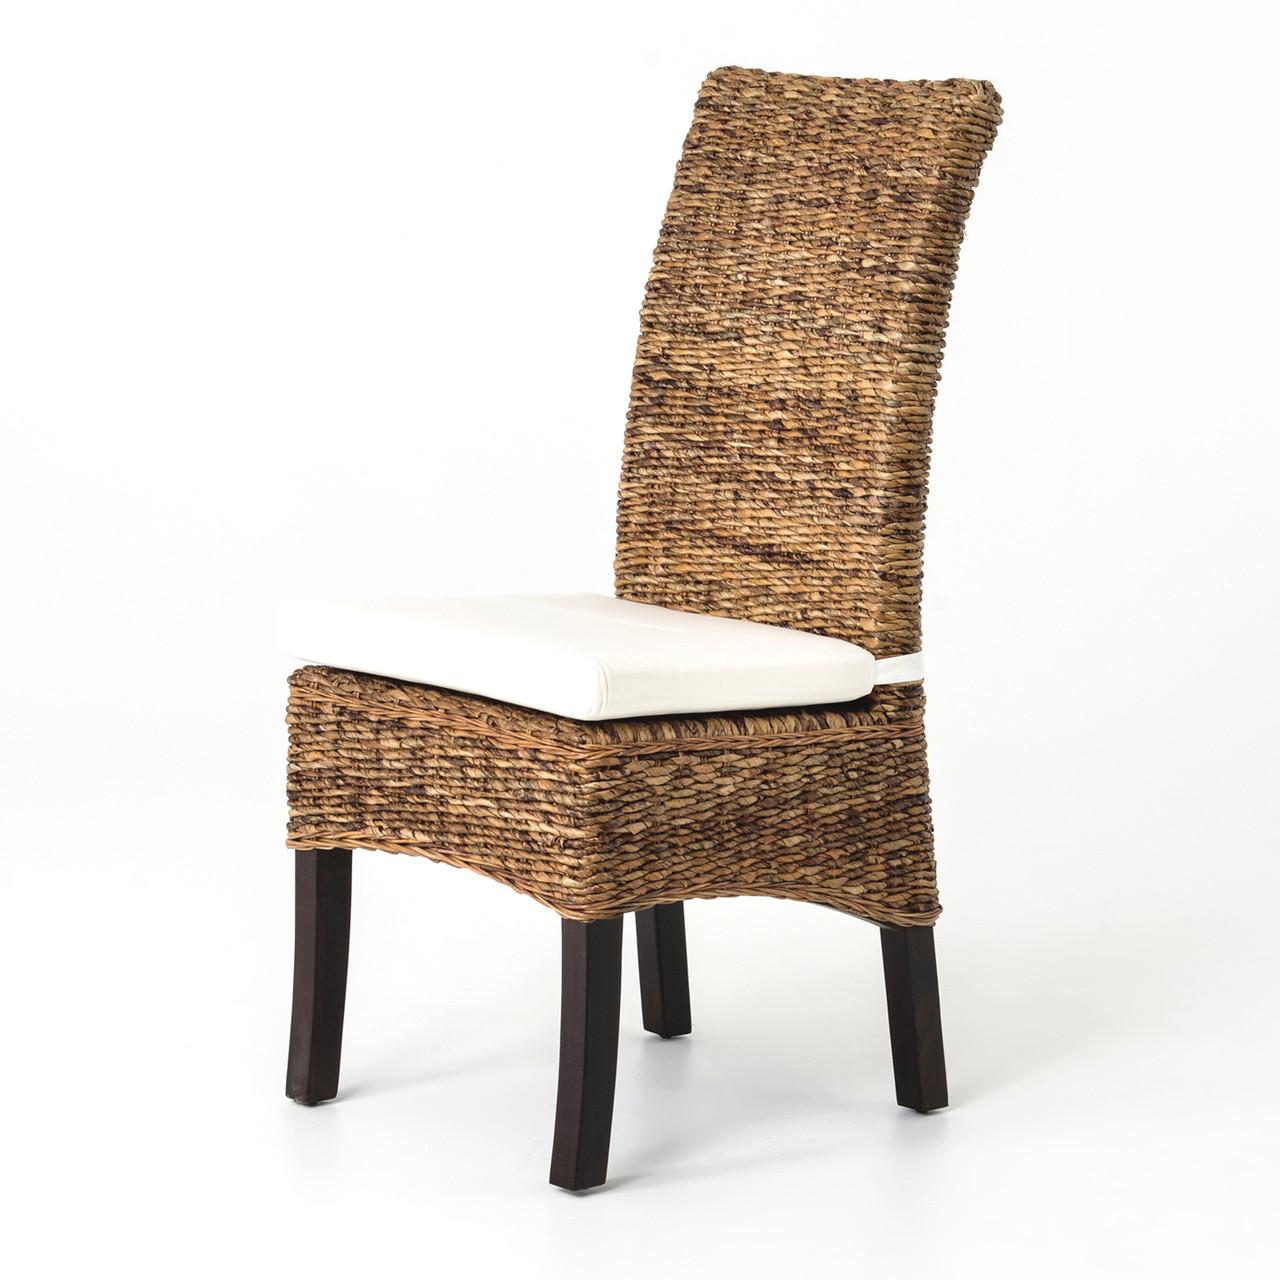 Natural Banana Leaf Chair